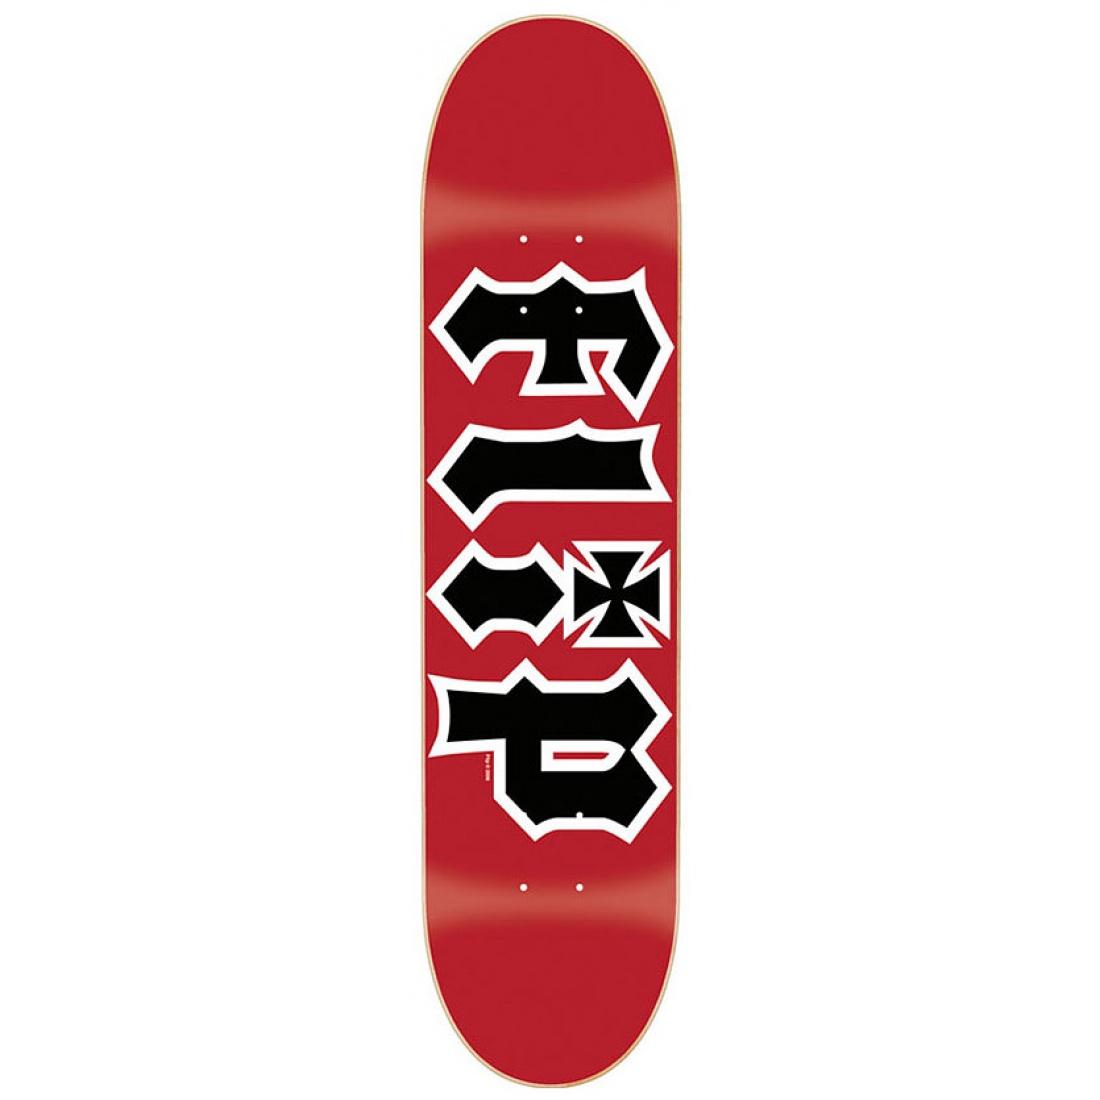 FLP-Team HKD Red 7.5 Deck